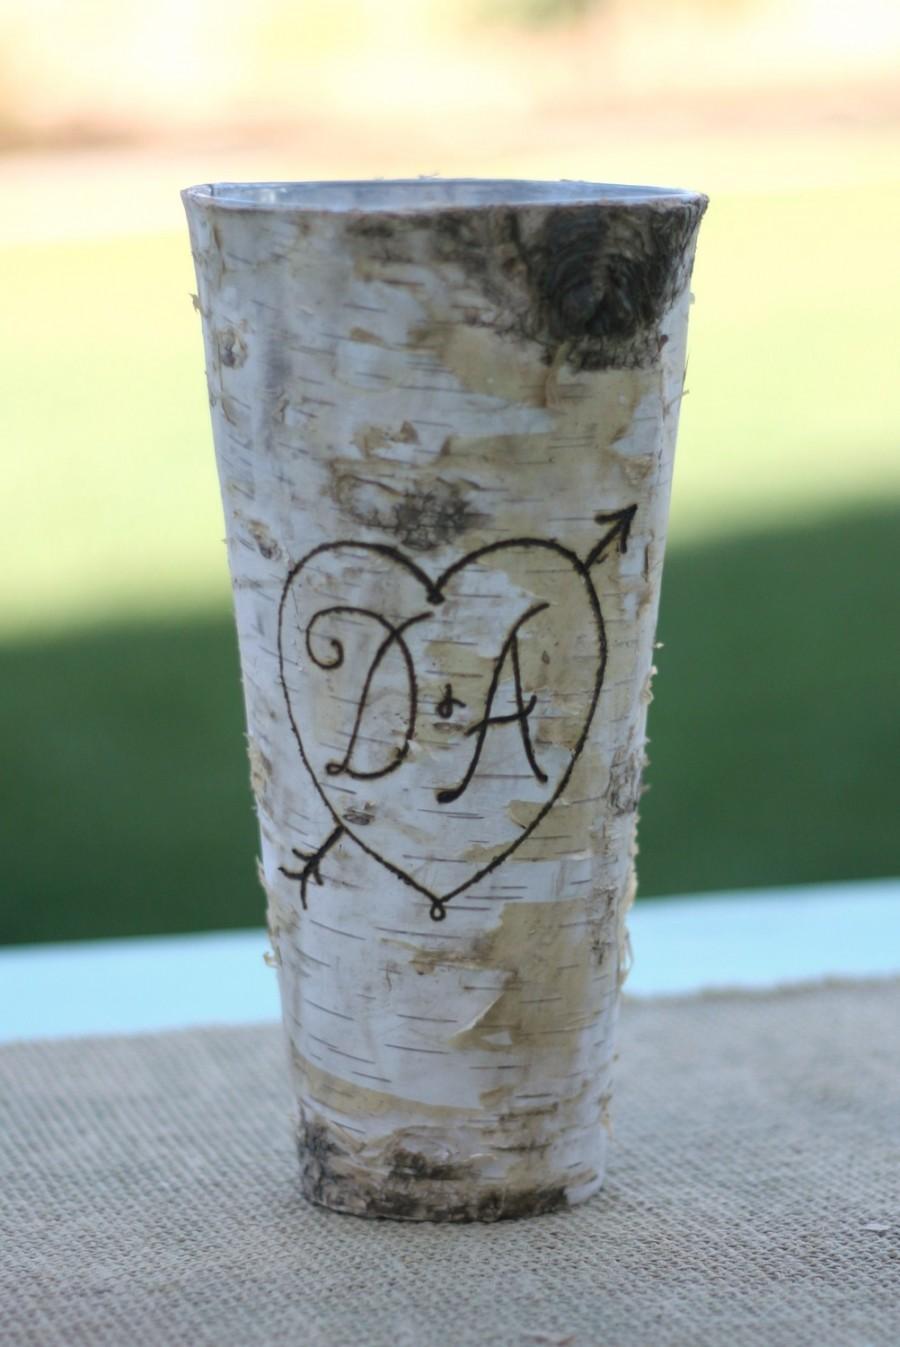 Hochzeit - Personalized Birch Bark Wood Vase (item E10543)